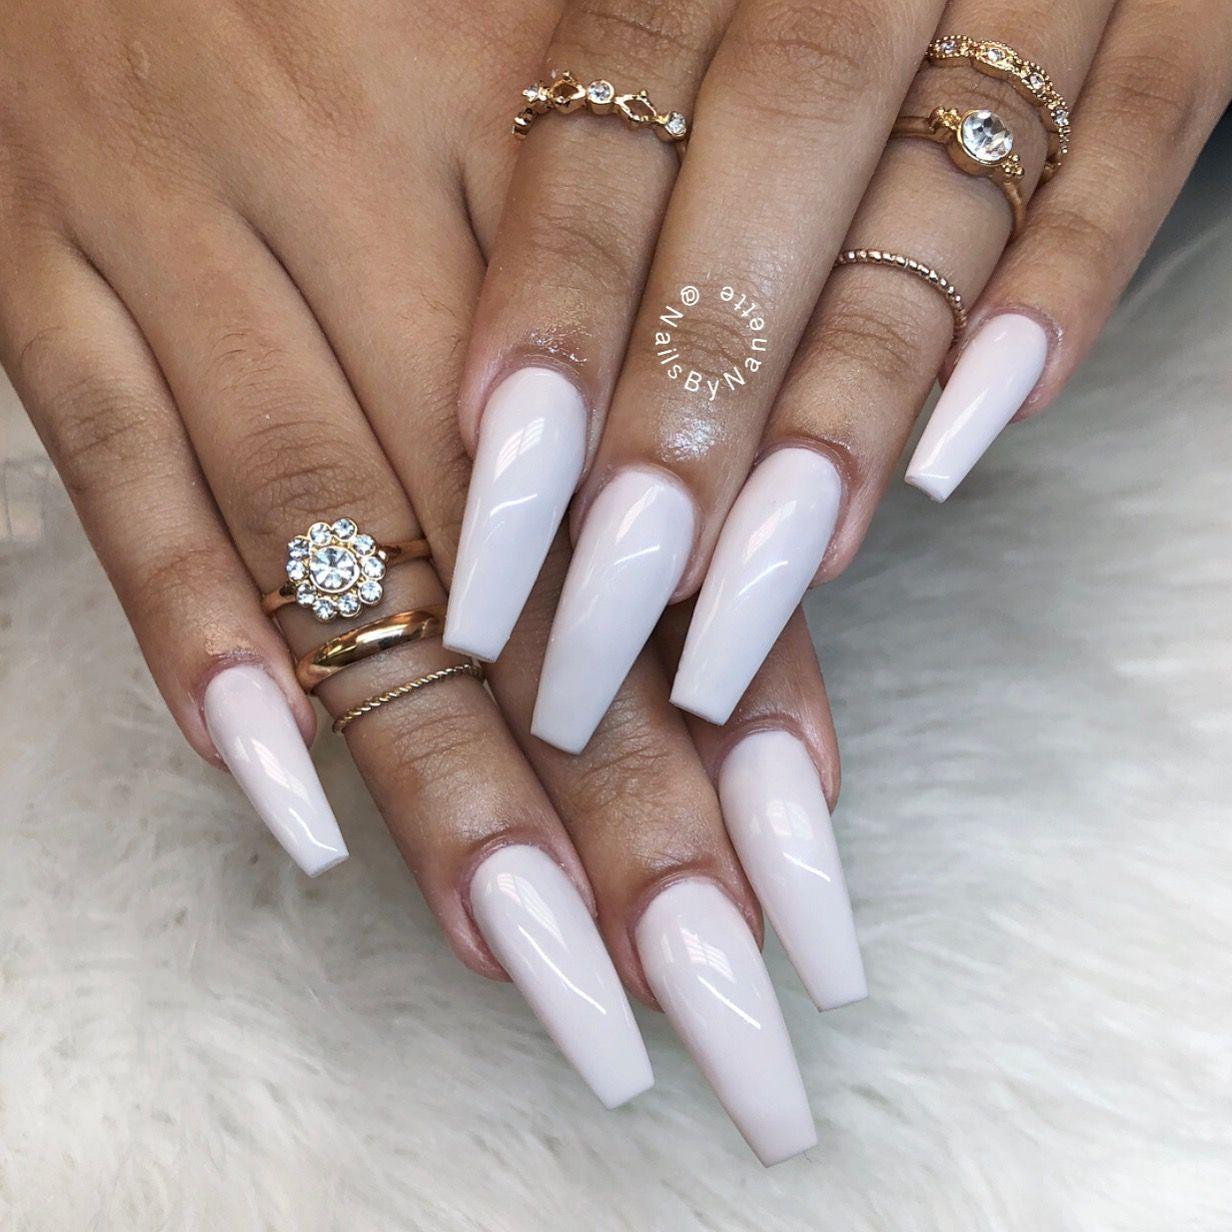 White nails, coffin nails, ballerina nails, nude nails